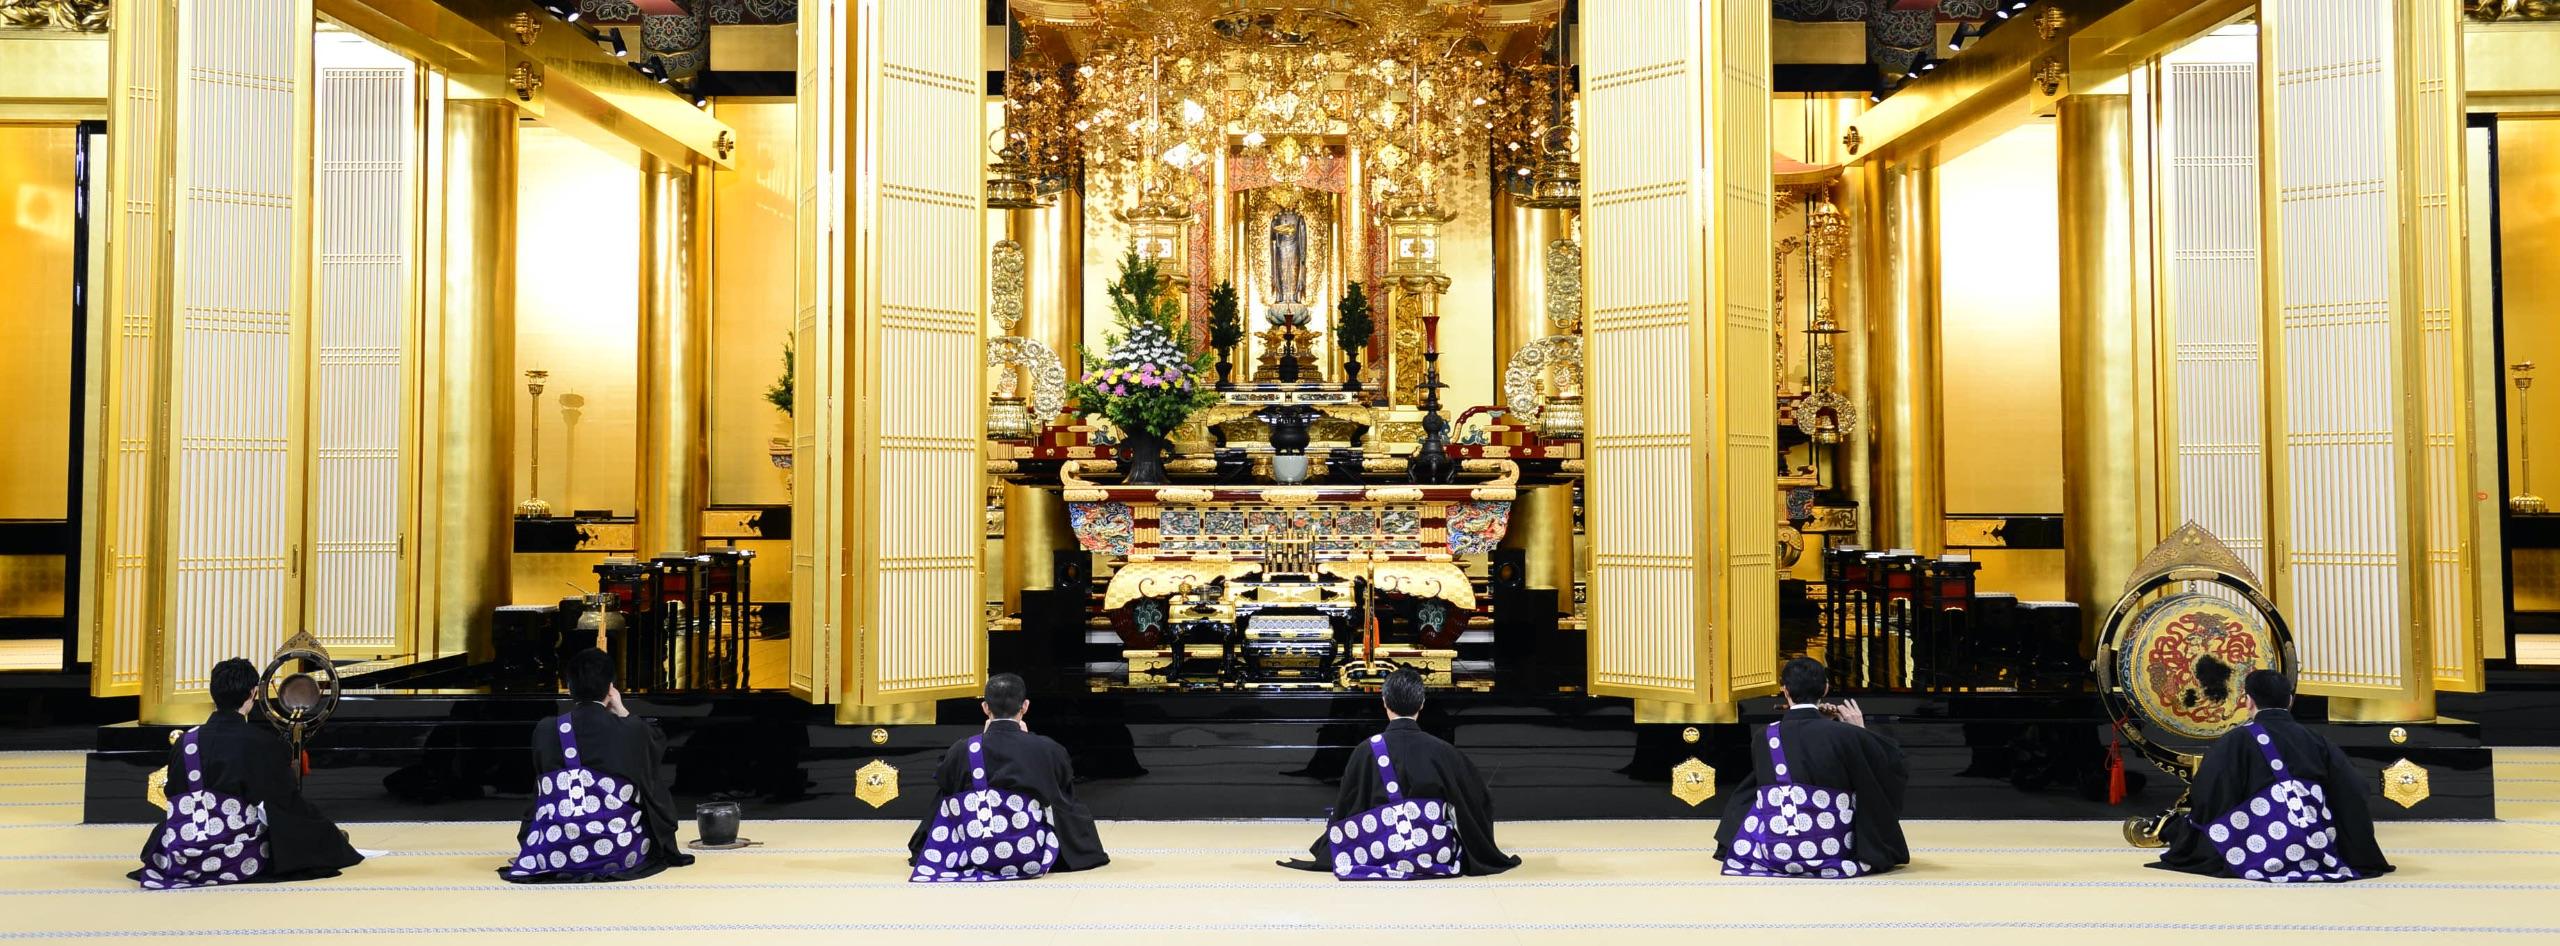 Come See the Hondo(Main Worship Hall).